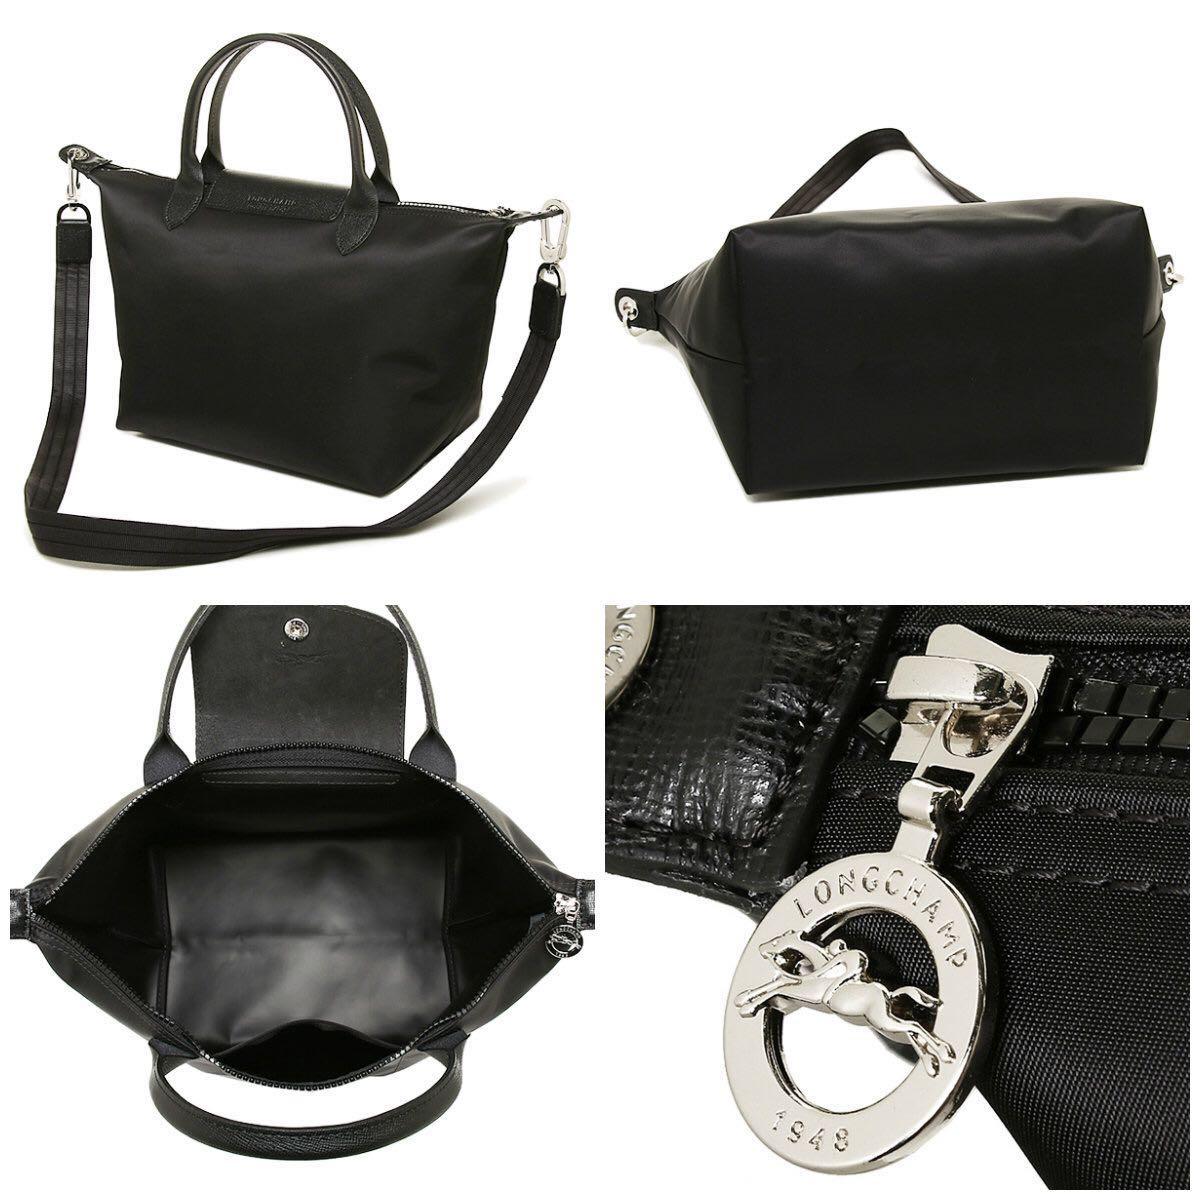 Authentic Black LongChamp Le Pliage Neo in Medium, Women s Fashion ... e8a702bfd5